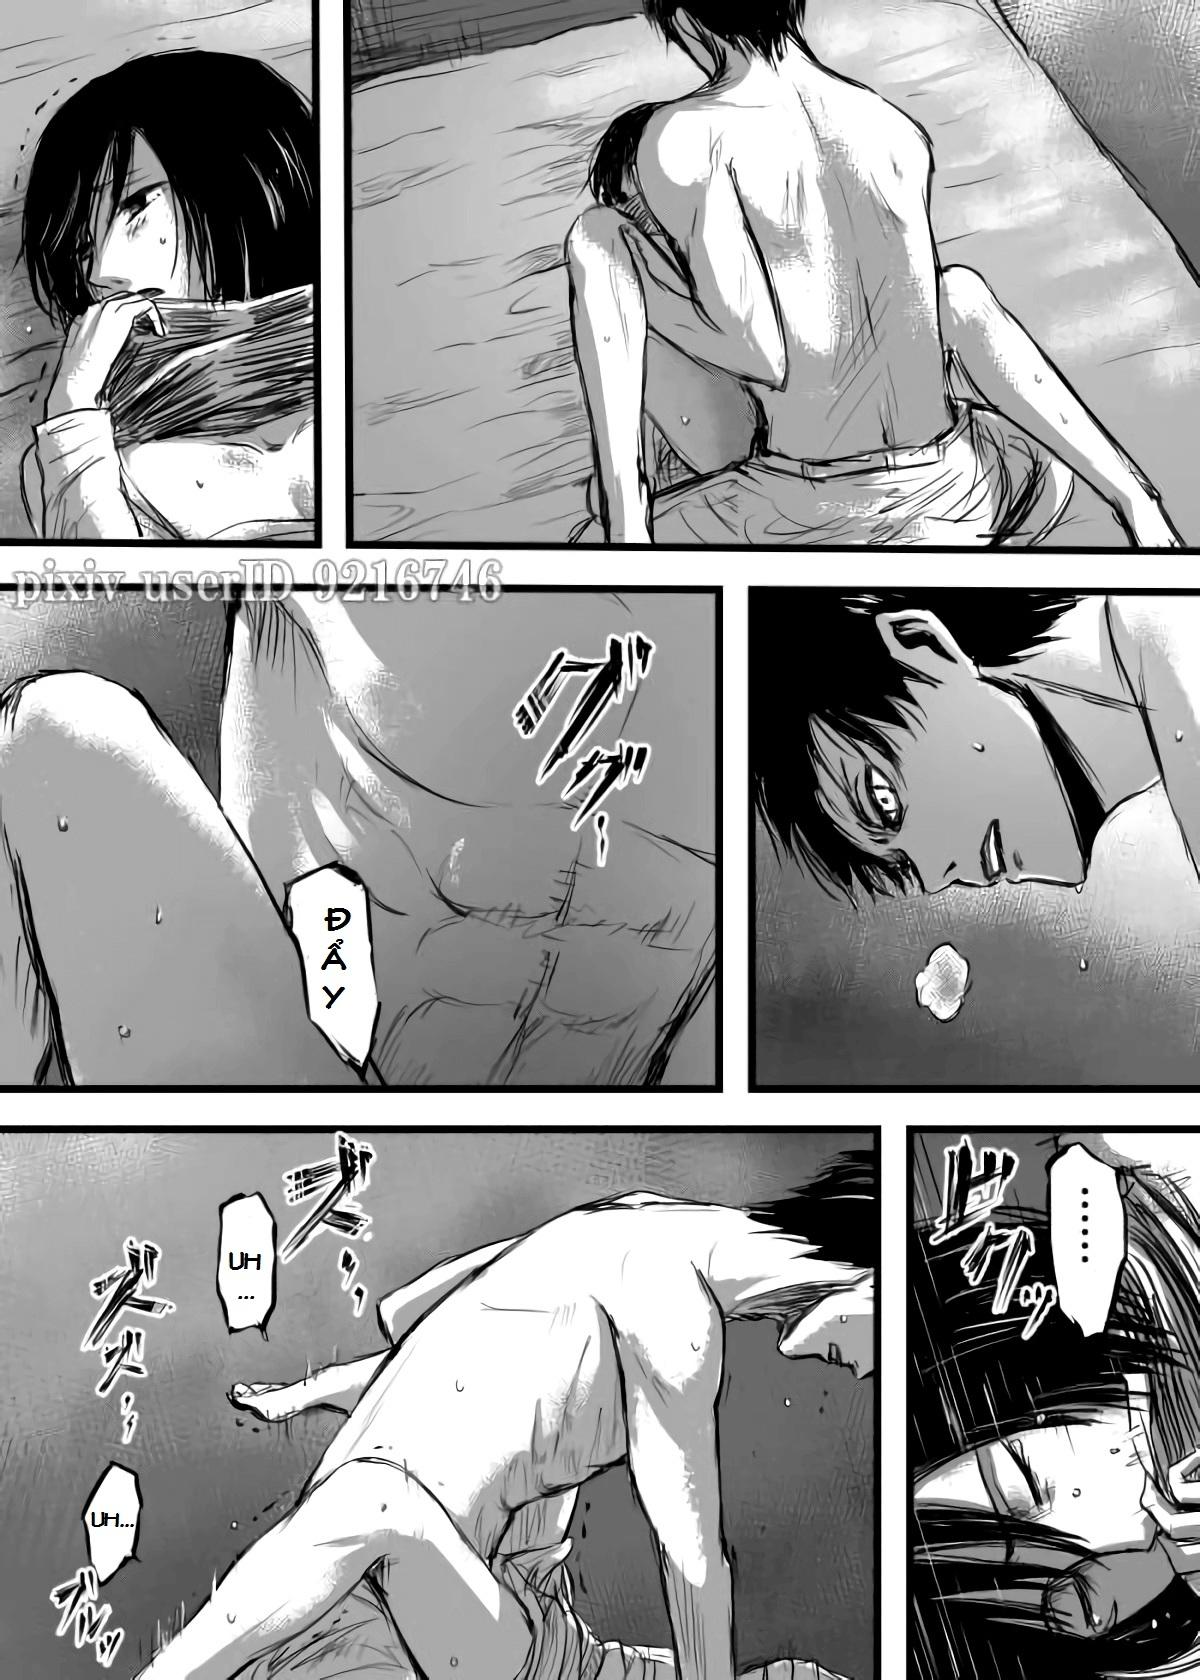 Hình ảnh  trong bài viết Eren X Mikasa AOT Hentai Read